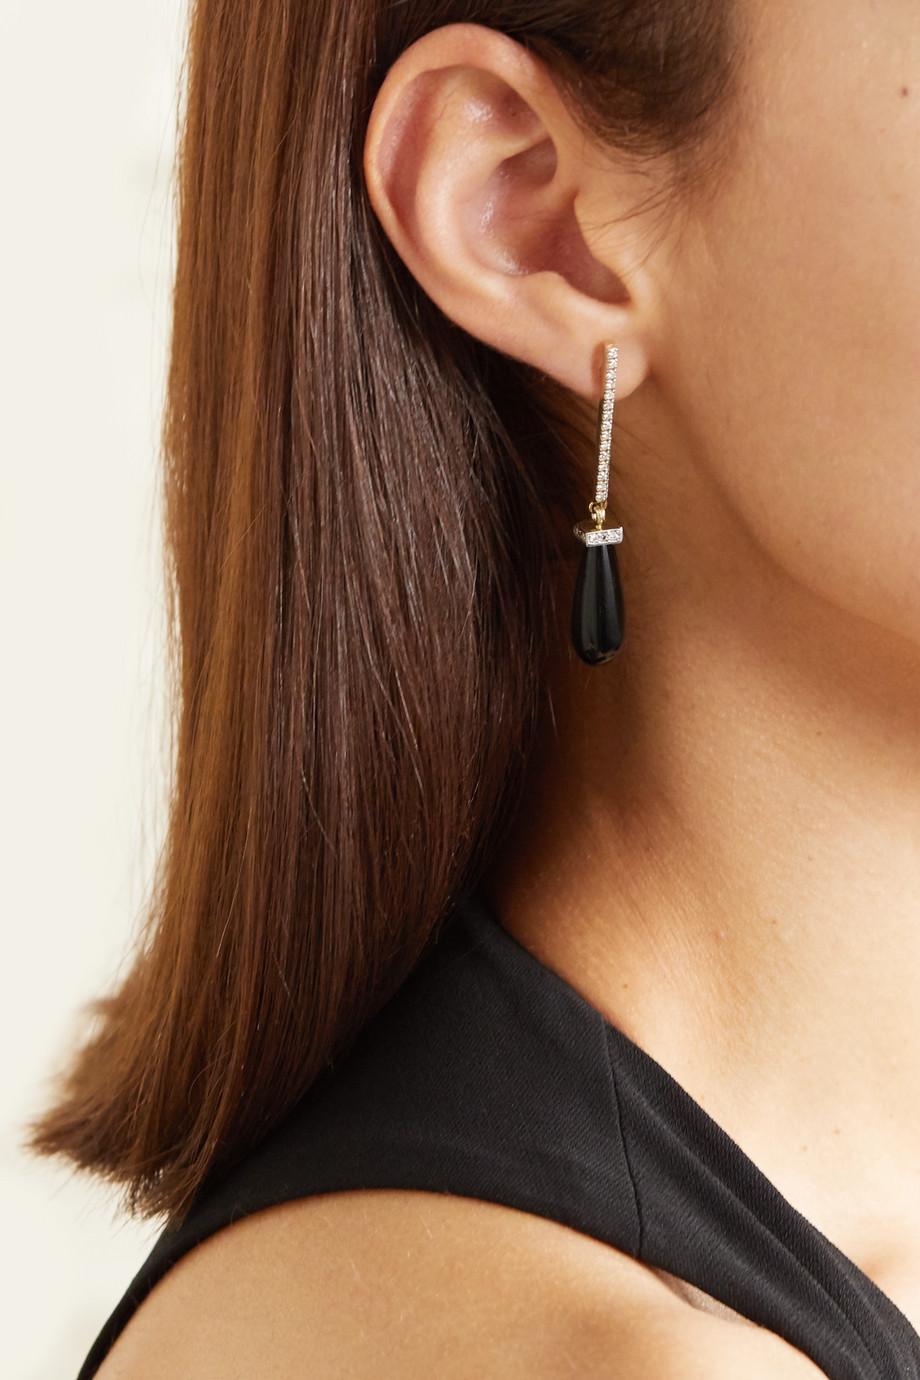 Mateo 14-karat gold, onyx and diamond earrings